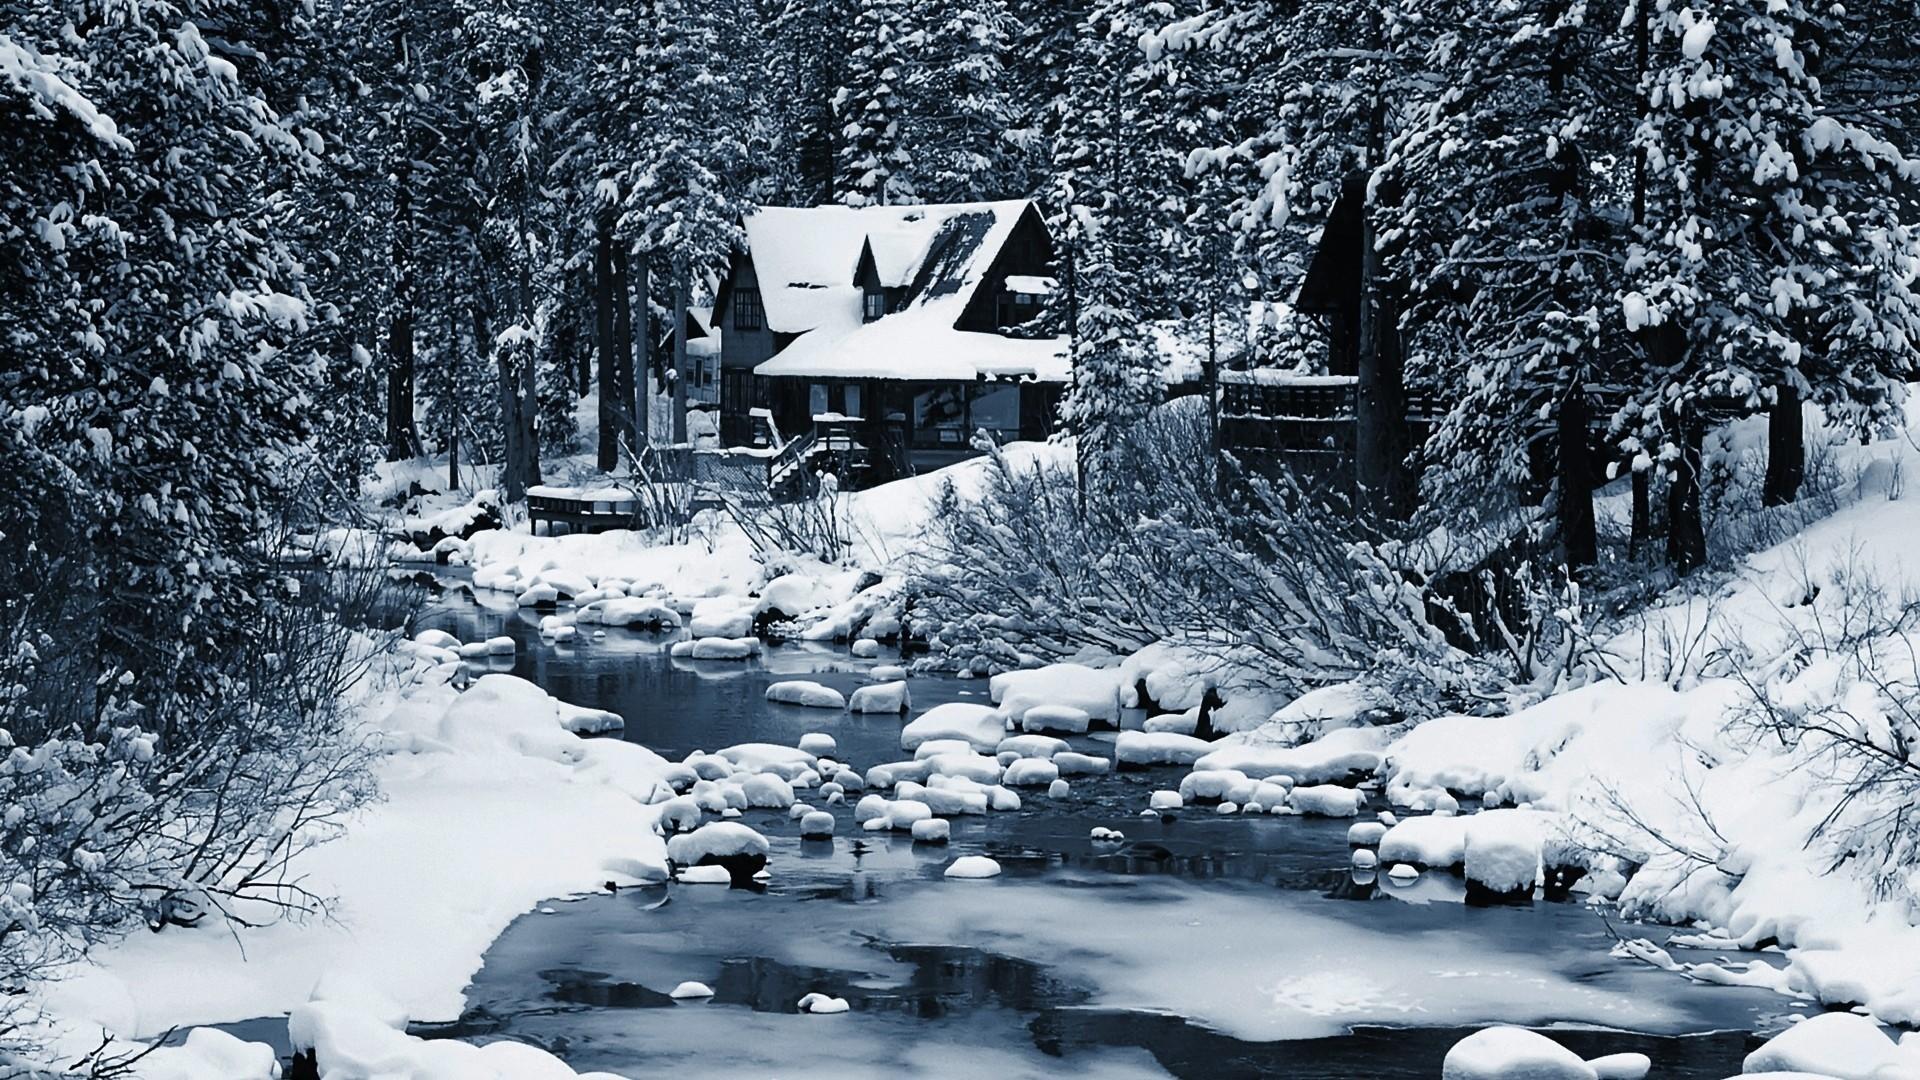 #CCCCDD Color – Riverside Forest Home Winter River House Rocks Wallpaper  For Desktop for HD